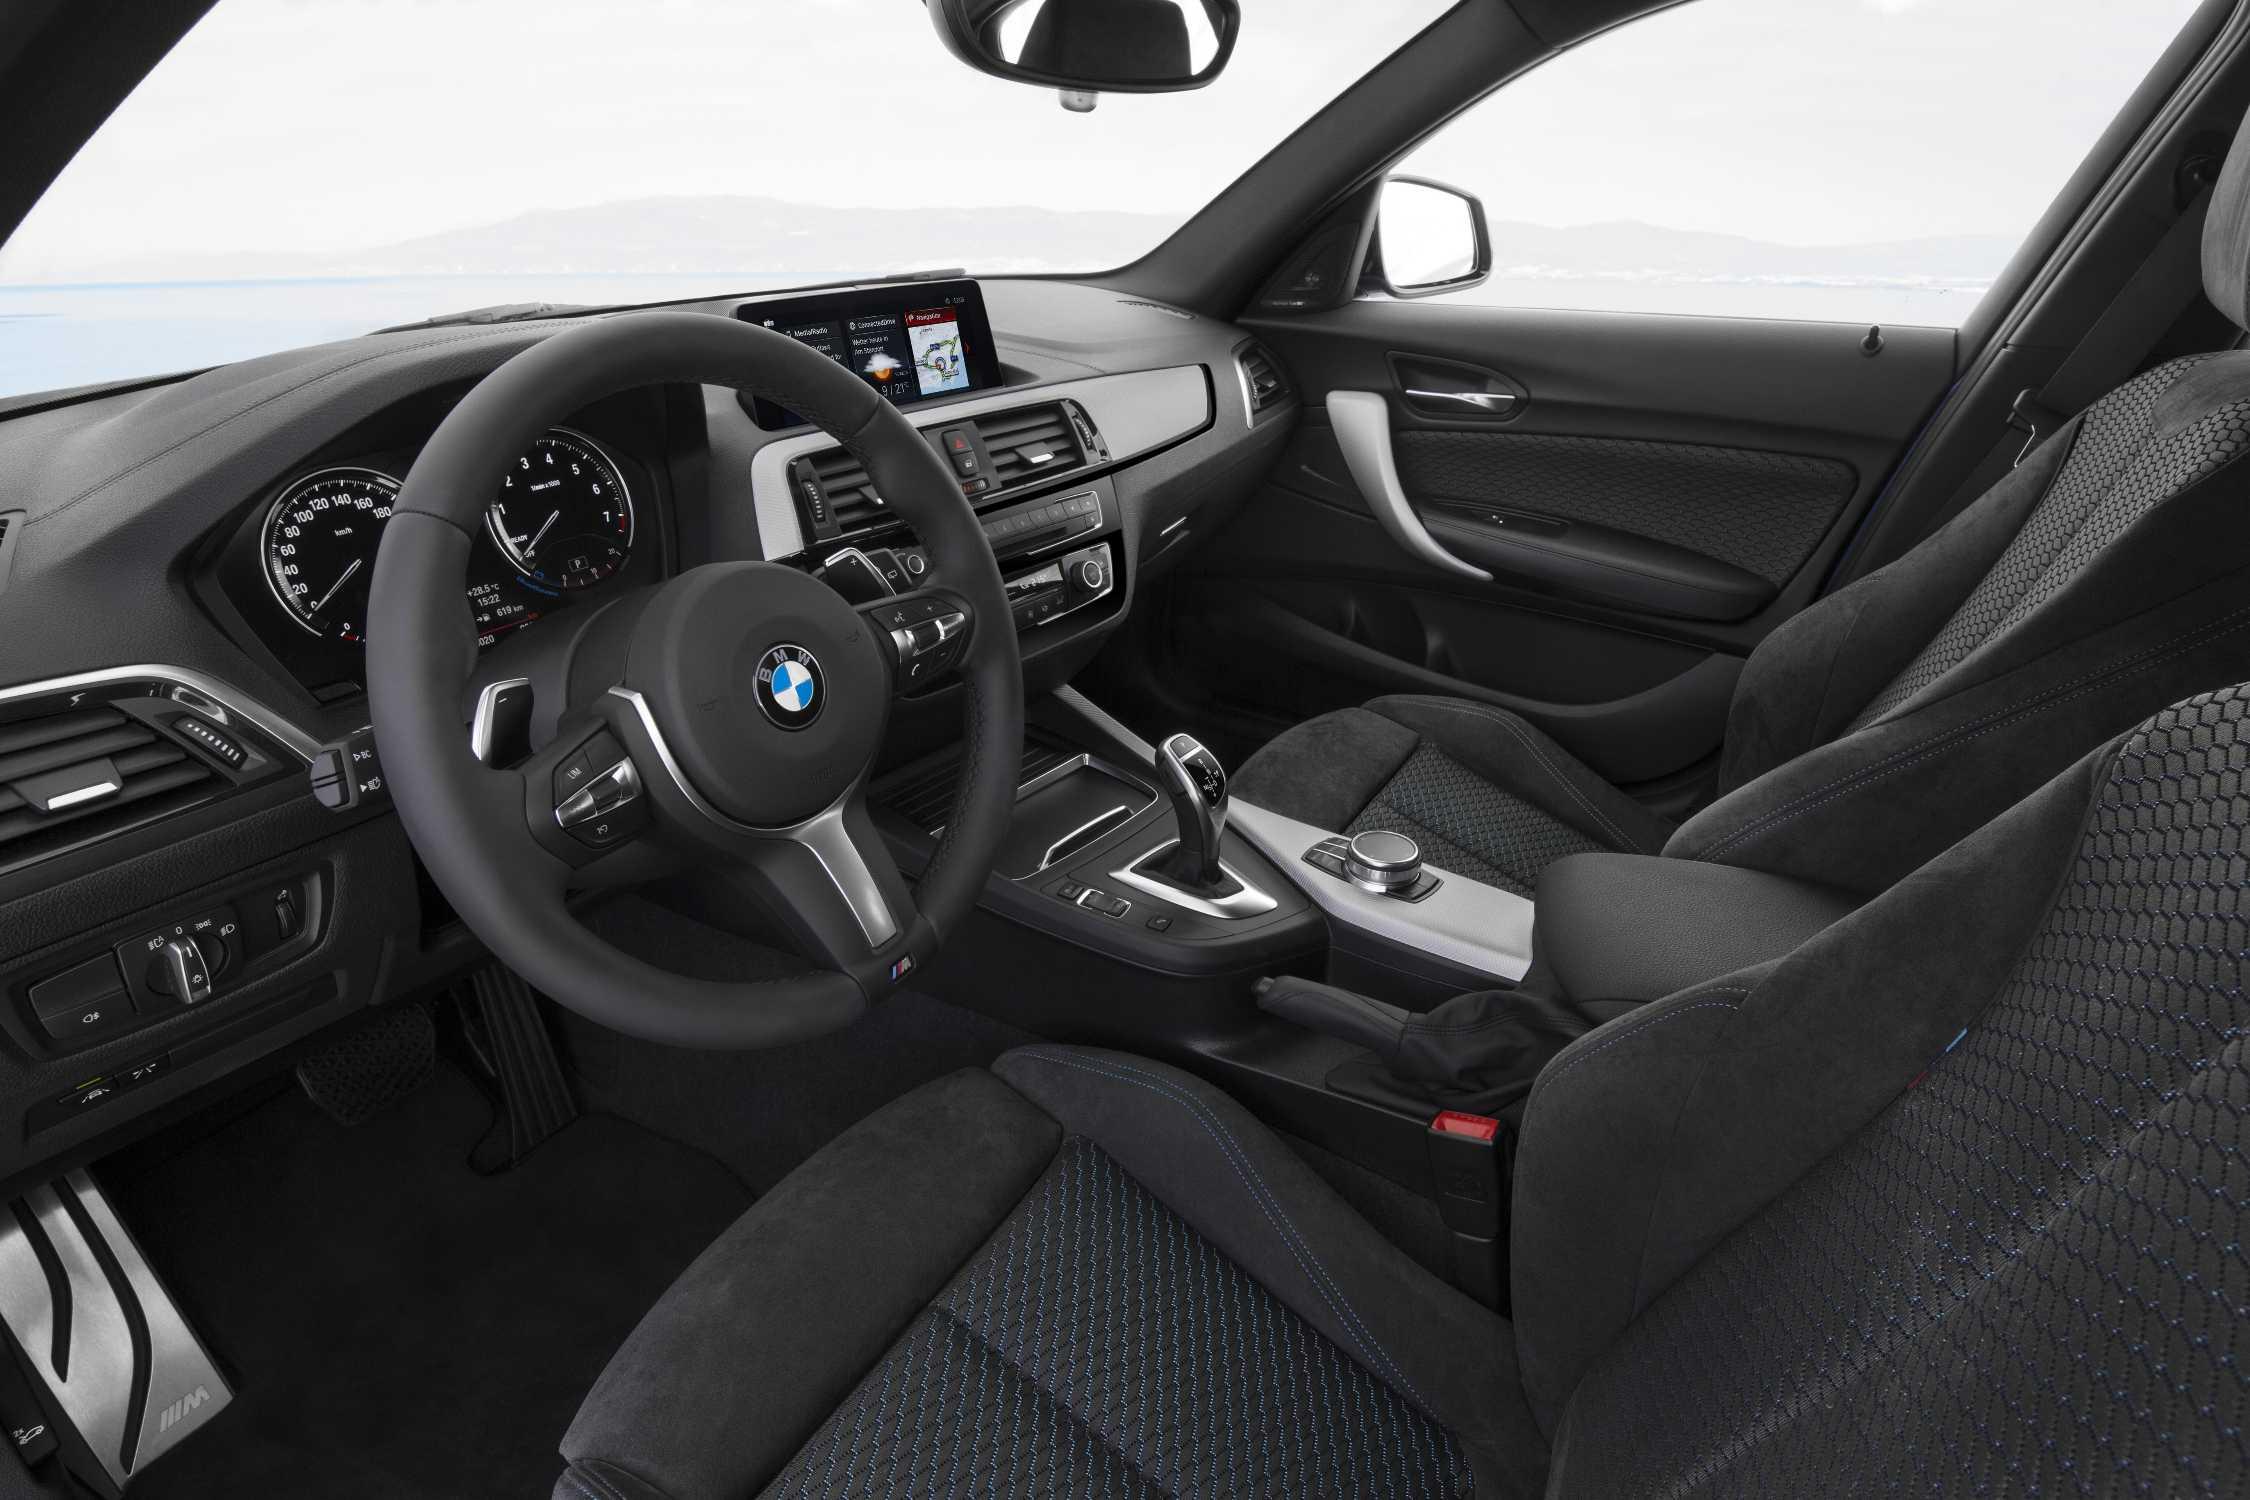 The New Bmw 1 Series Interior 05 2017